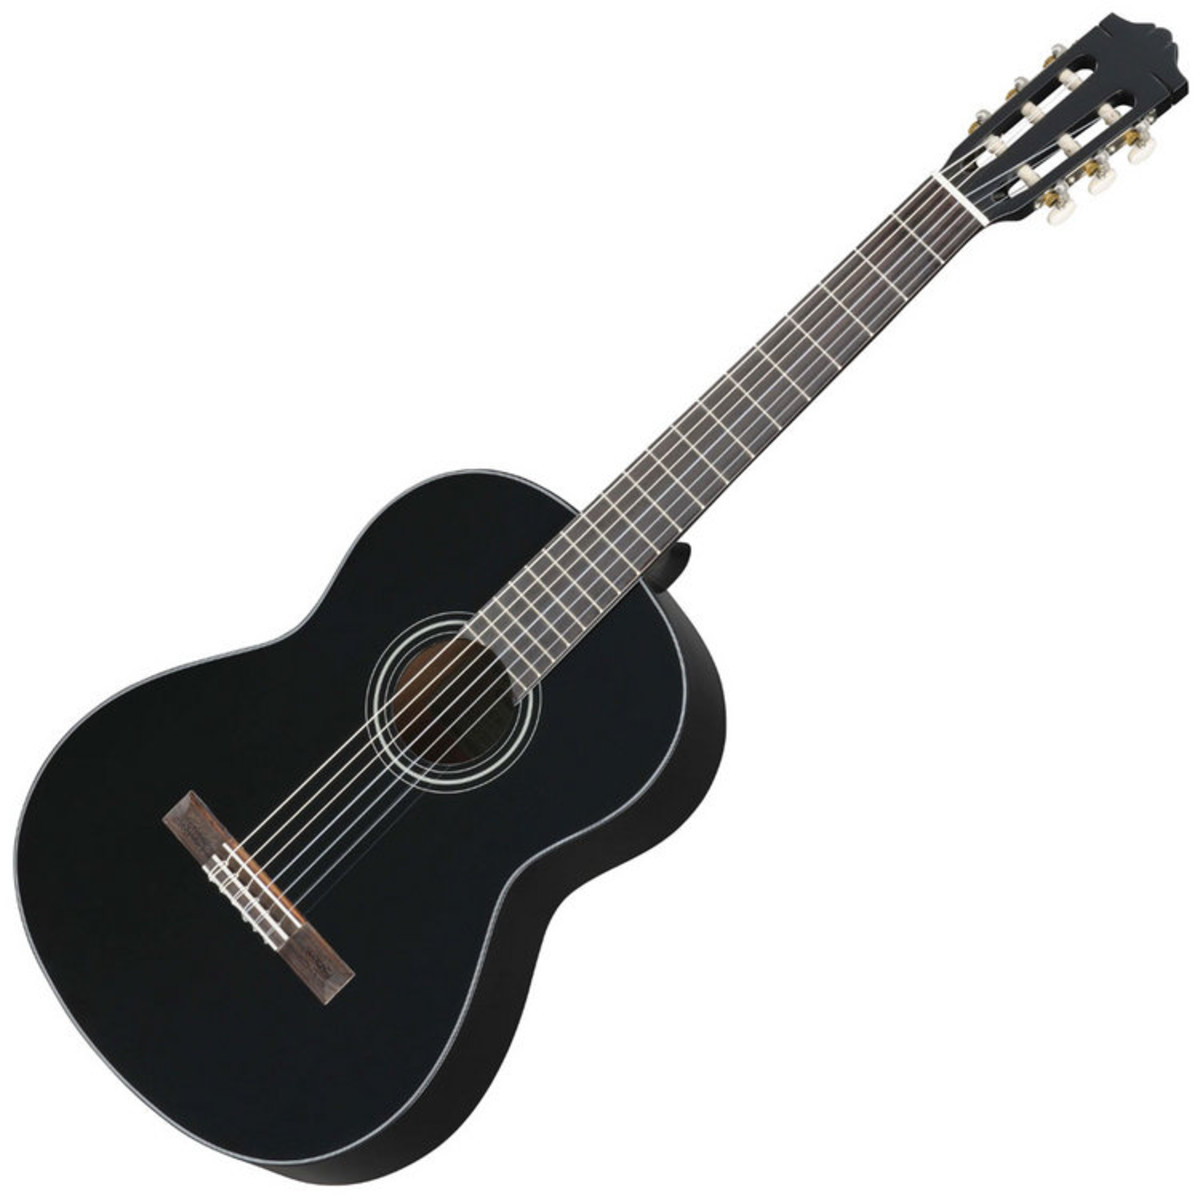 yamaha c40 classical acoustic guitar black en. Black Bedroom Furniture Sets. Home Design Ideas